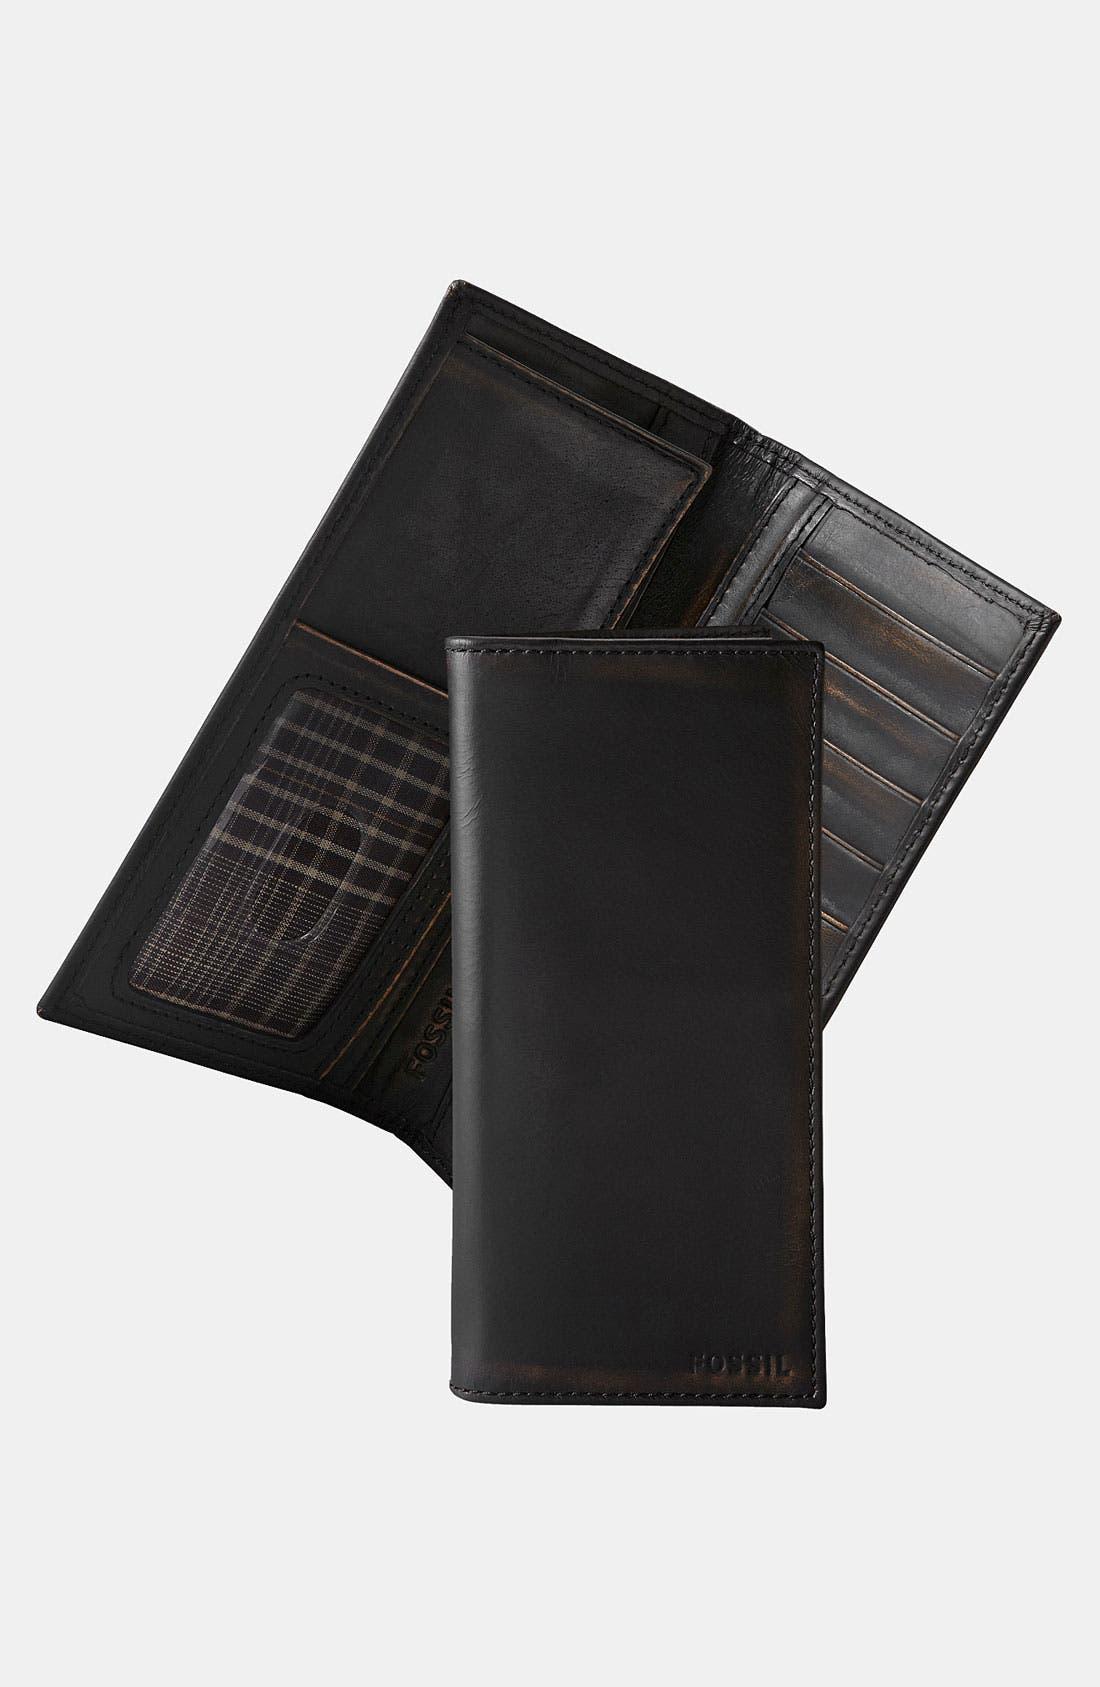 Main Image - Fossil 'Carson' Secretary Wallet